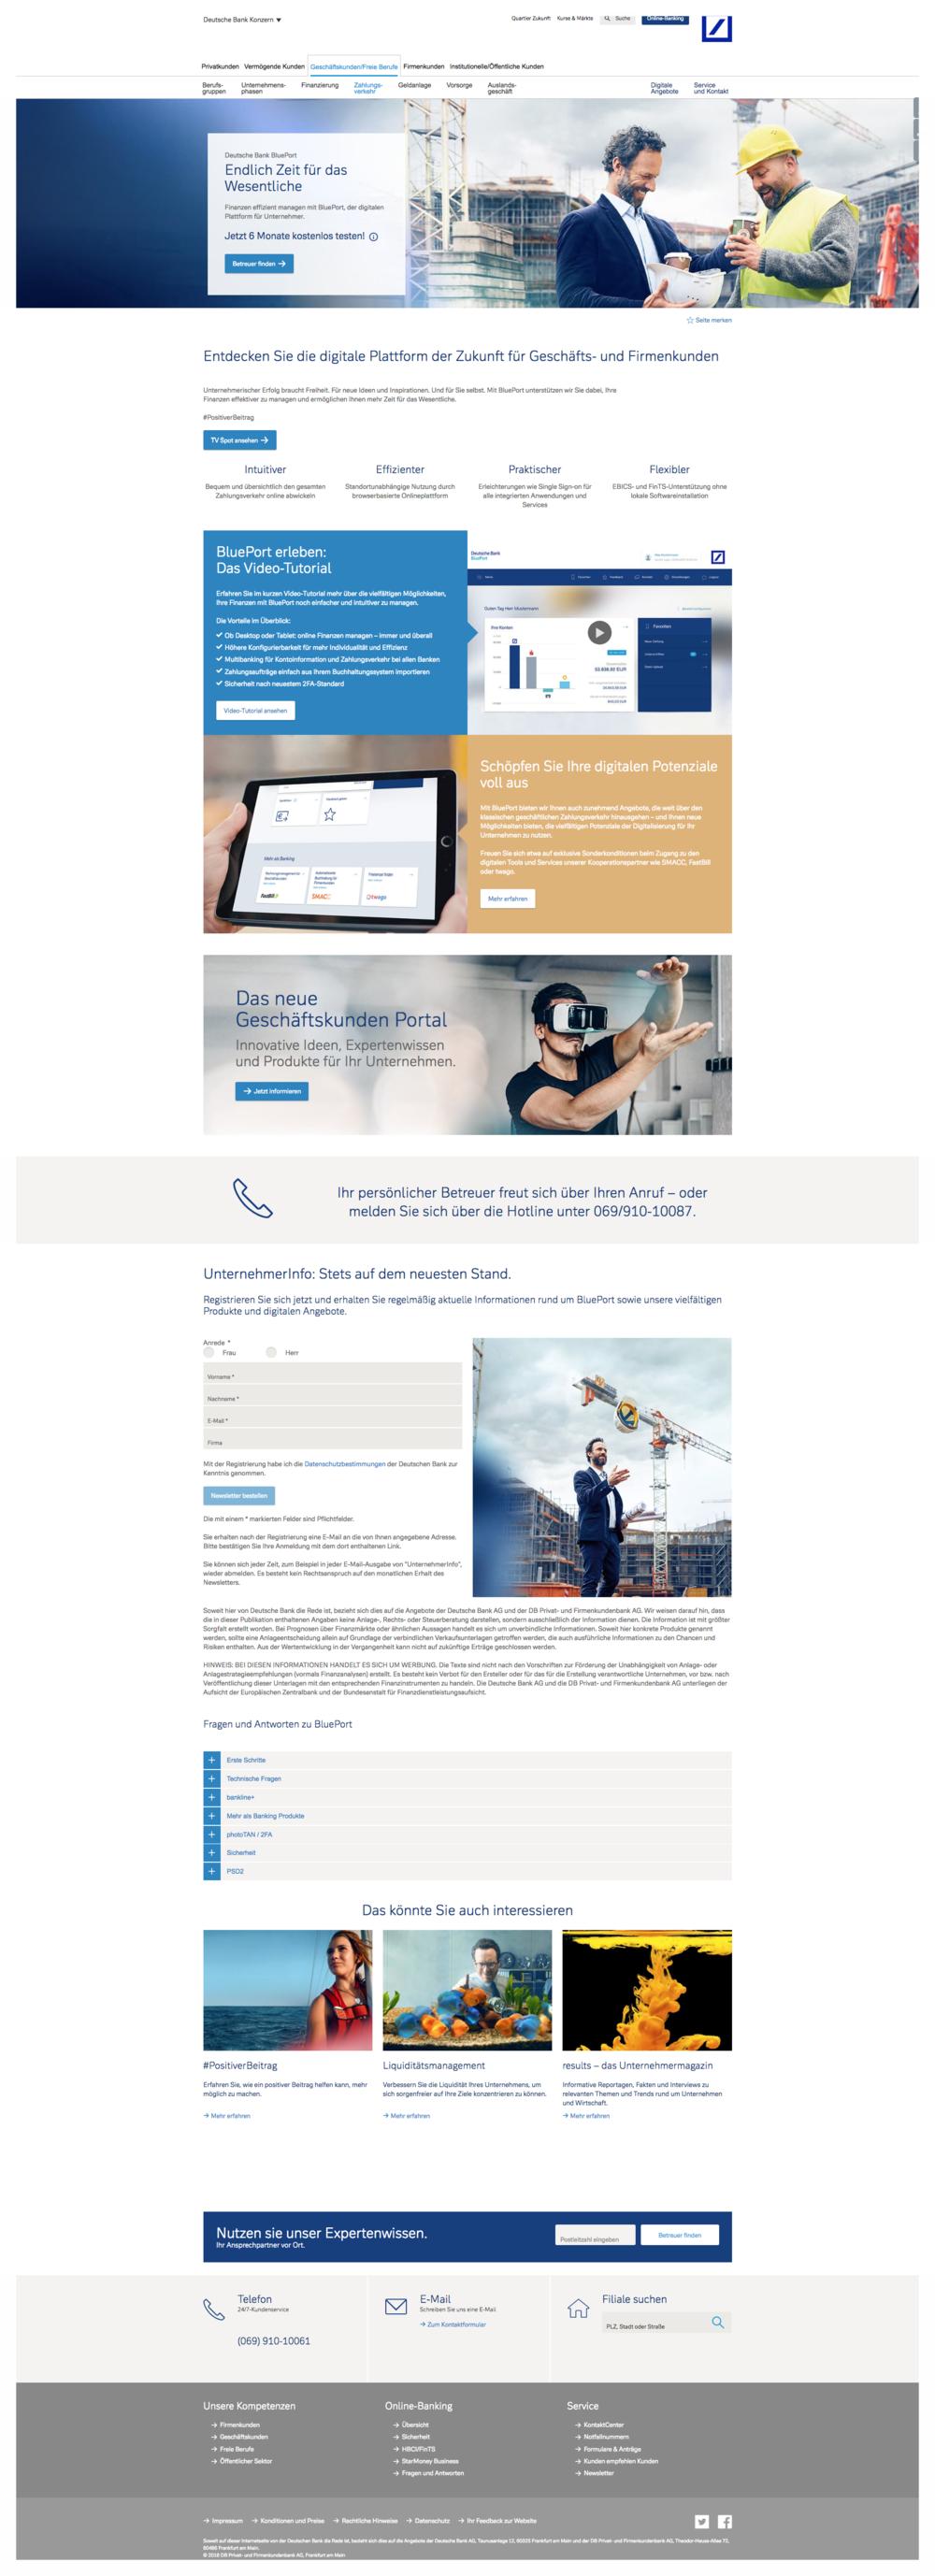 BluePort – Deutsche Bank Geschäftskund_ - https___www.deutsche-bank.de_gk_za.png